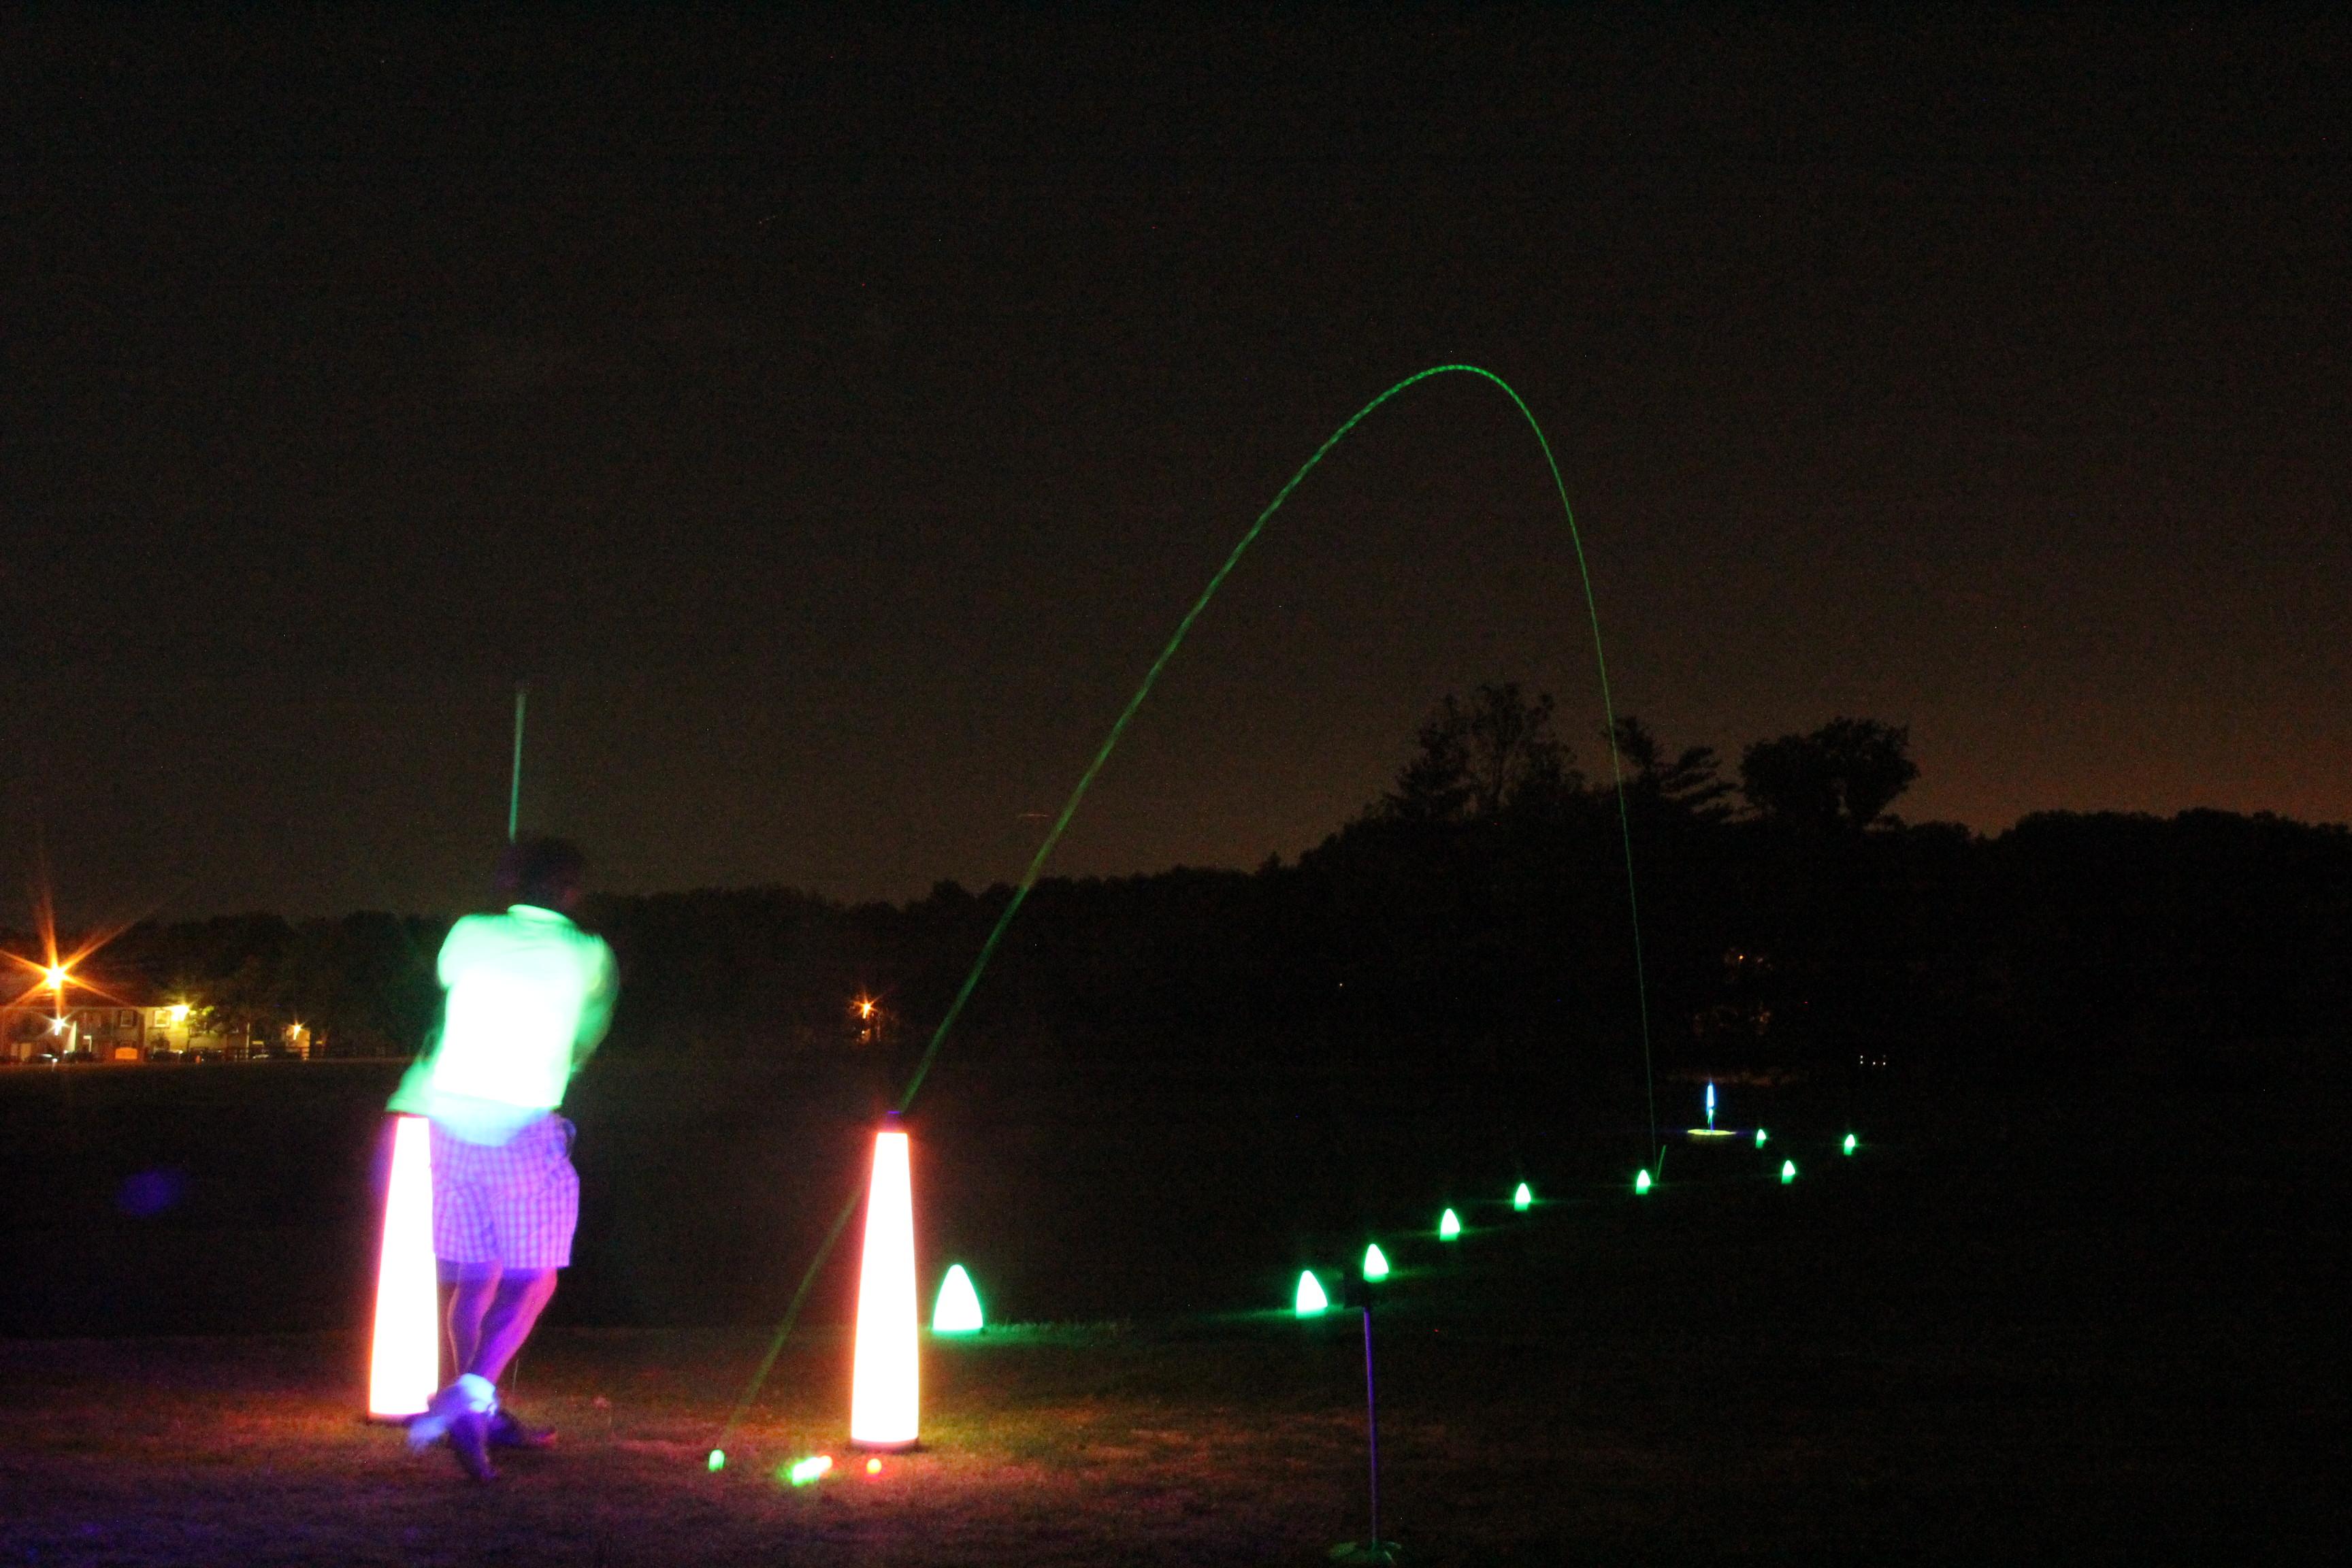 Night Golf at Sydney Marovitz Golf Course in Chicago, Illinois